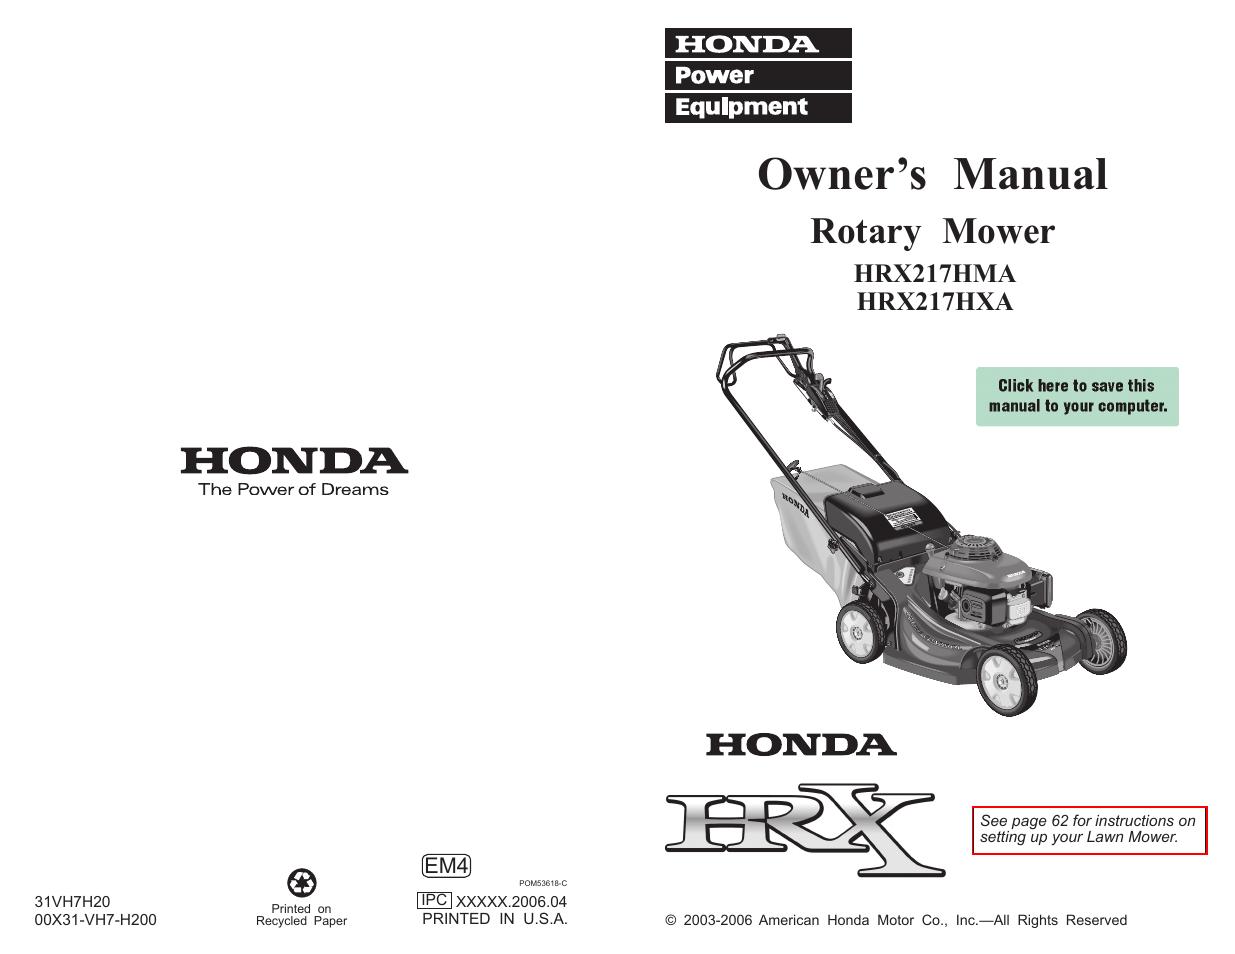 honda hrx217hxa user manual 86 pages also for hrx217hma rh manualsdir com Honda Push Mowers Self-Propelled Honda Push Mowers Self-Propelled